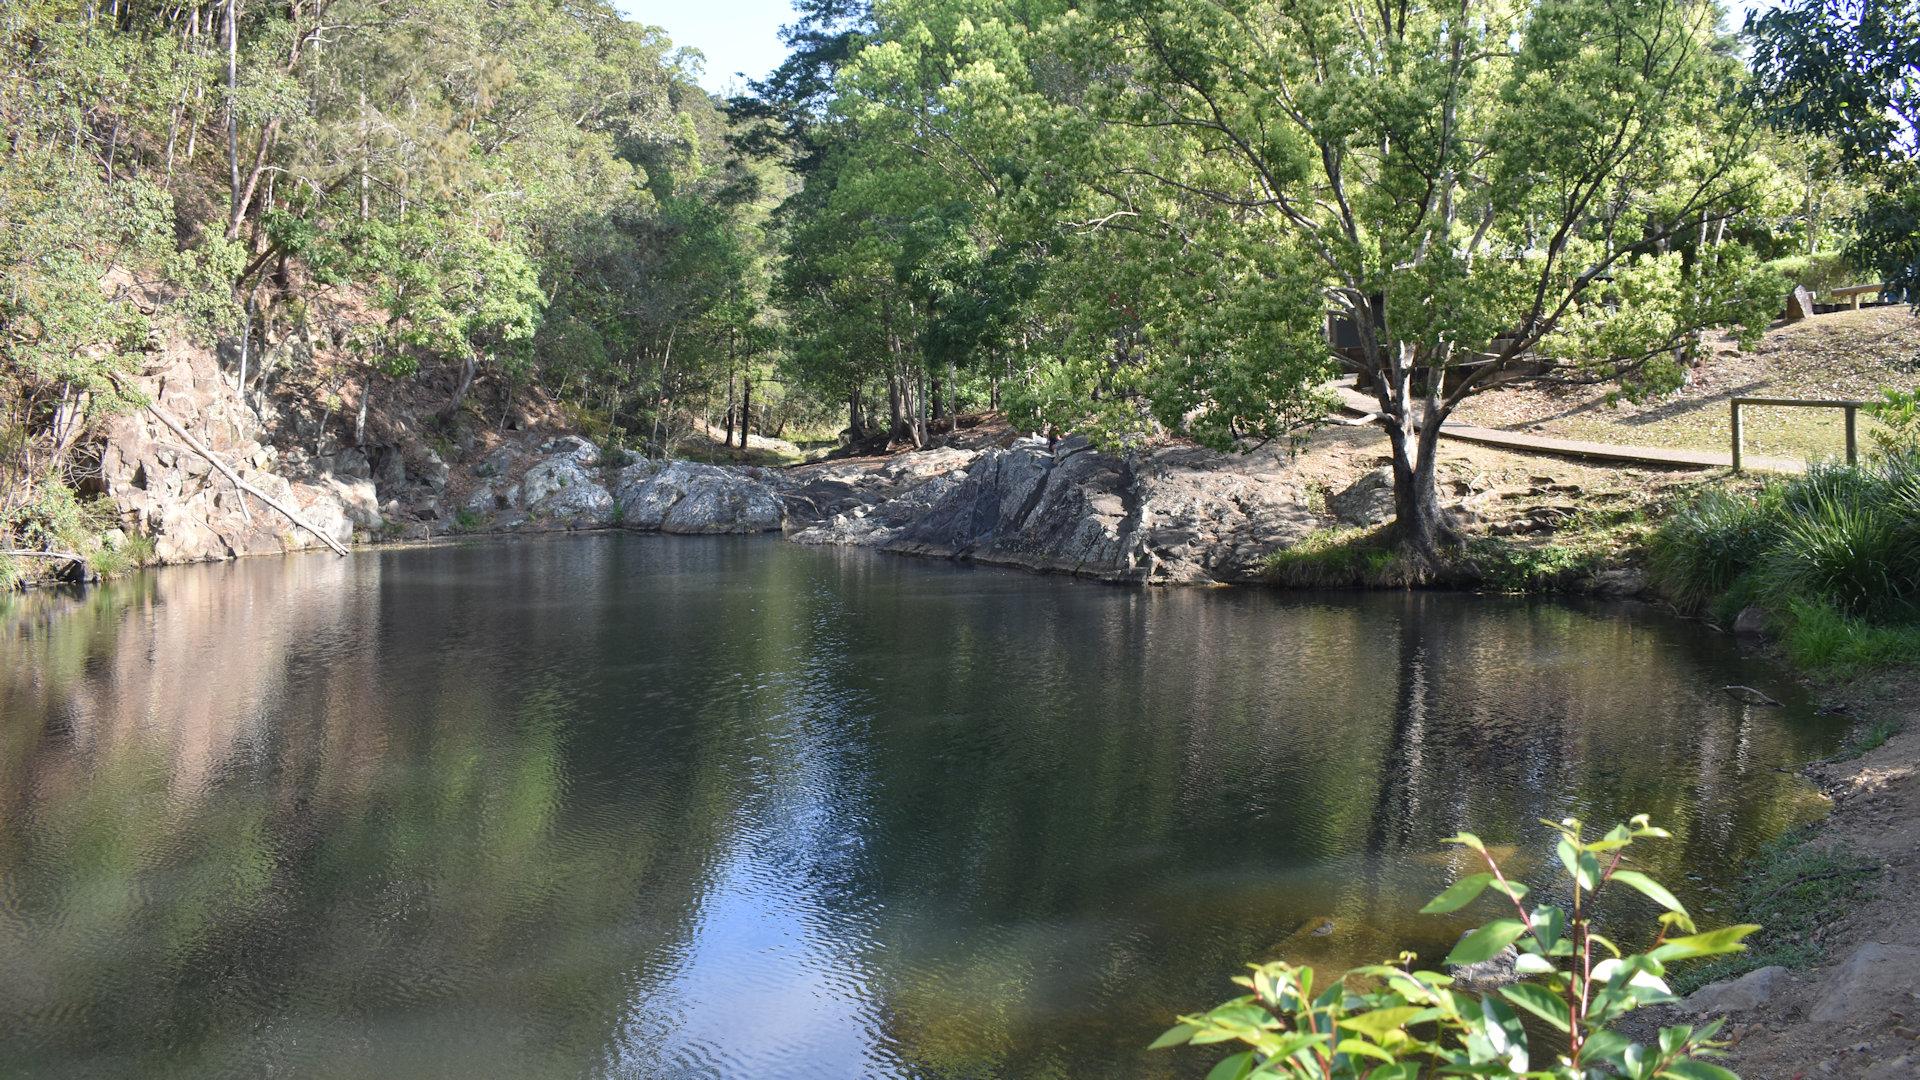 Currumbin Rock Pool in the Currumbin Valley, Gold Coast